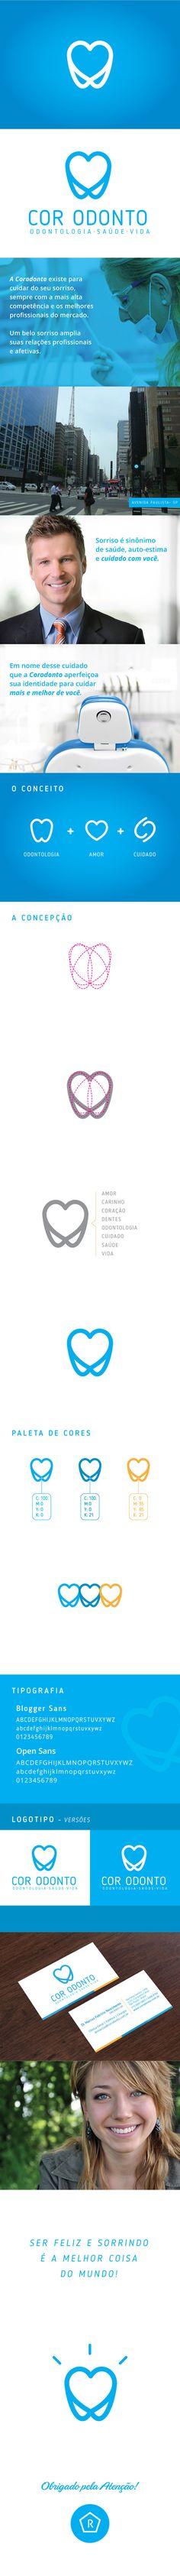 Cor Odonto - Odontologia Saúde e Vida on Behance